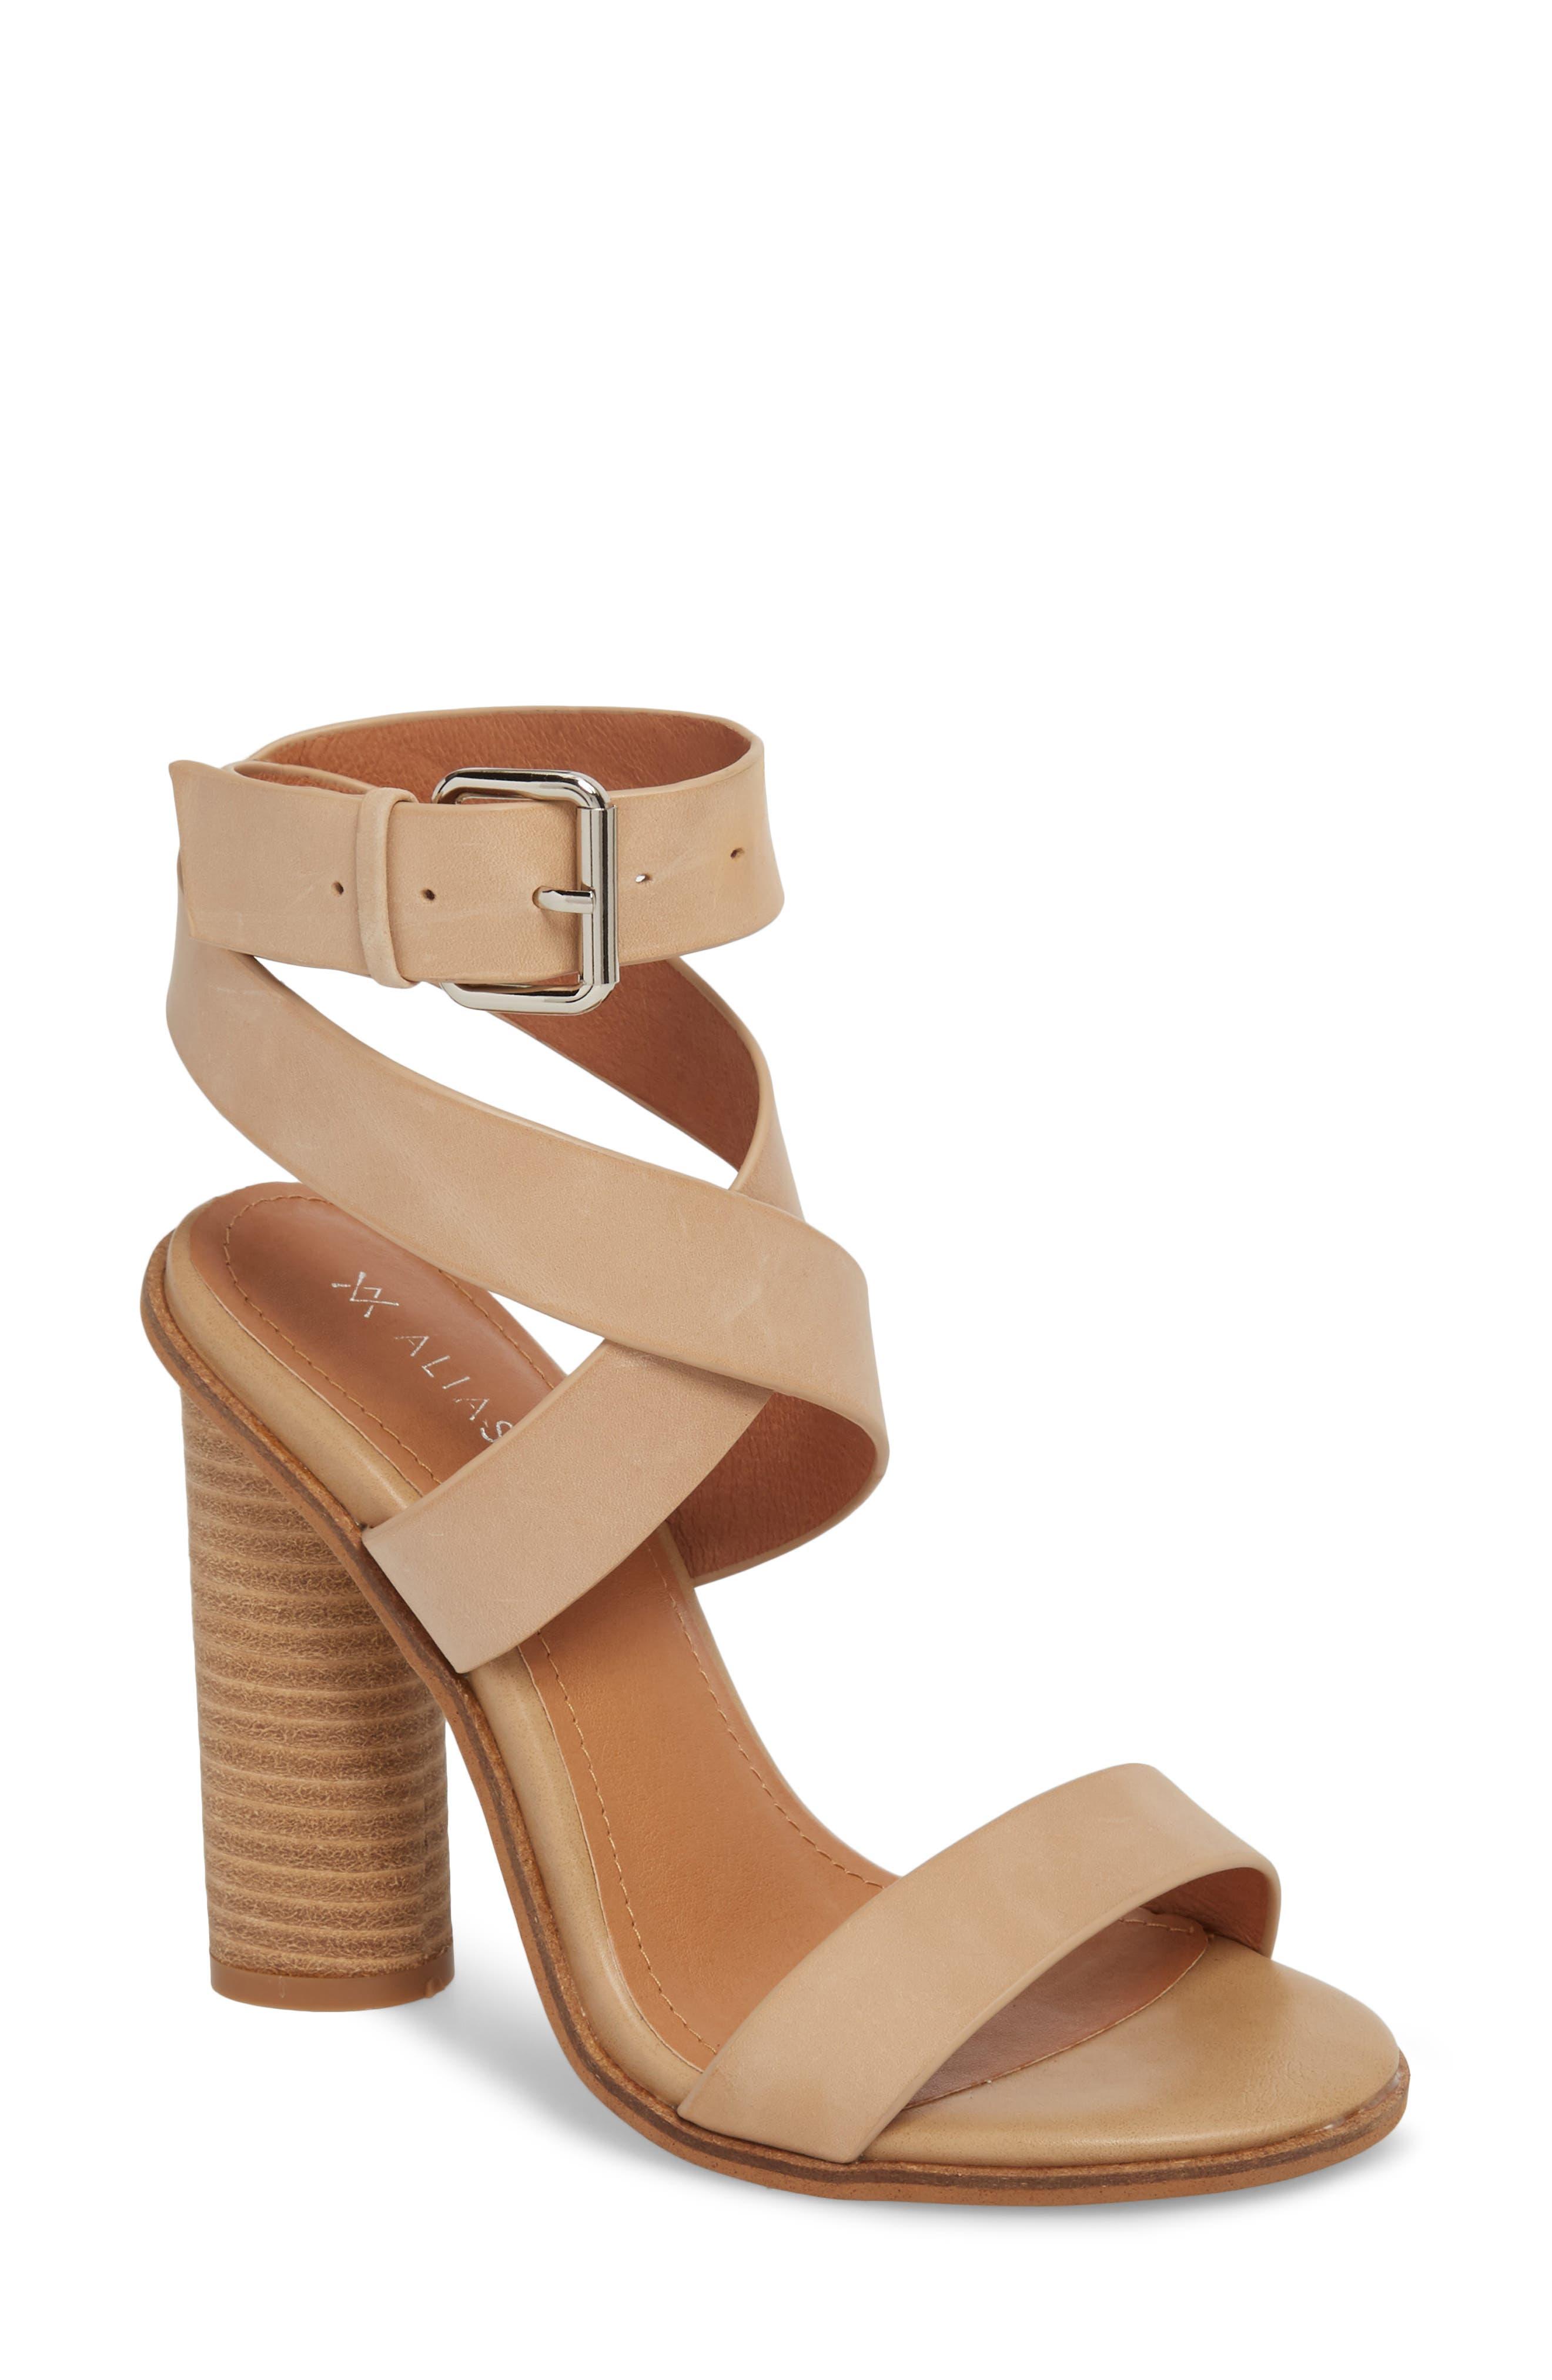 Abaala Cross Strap Sandal,                         Main,                         color,